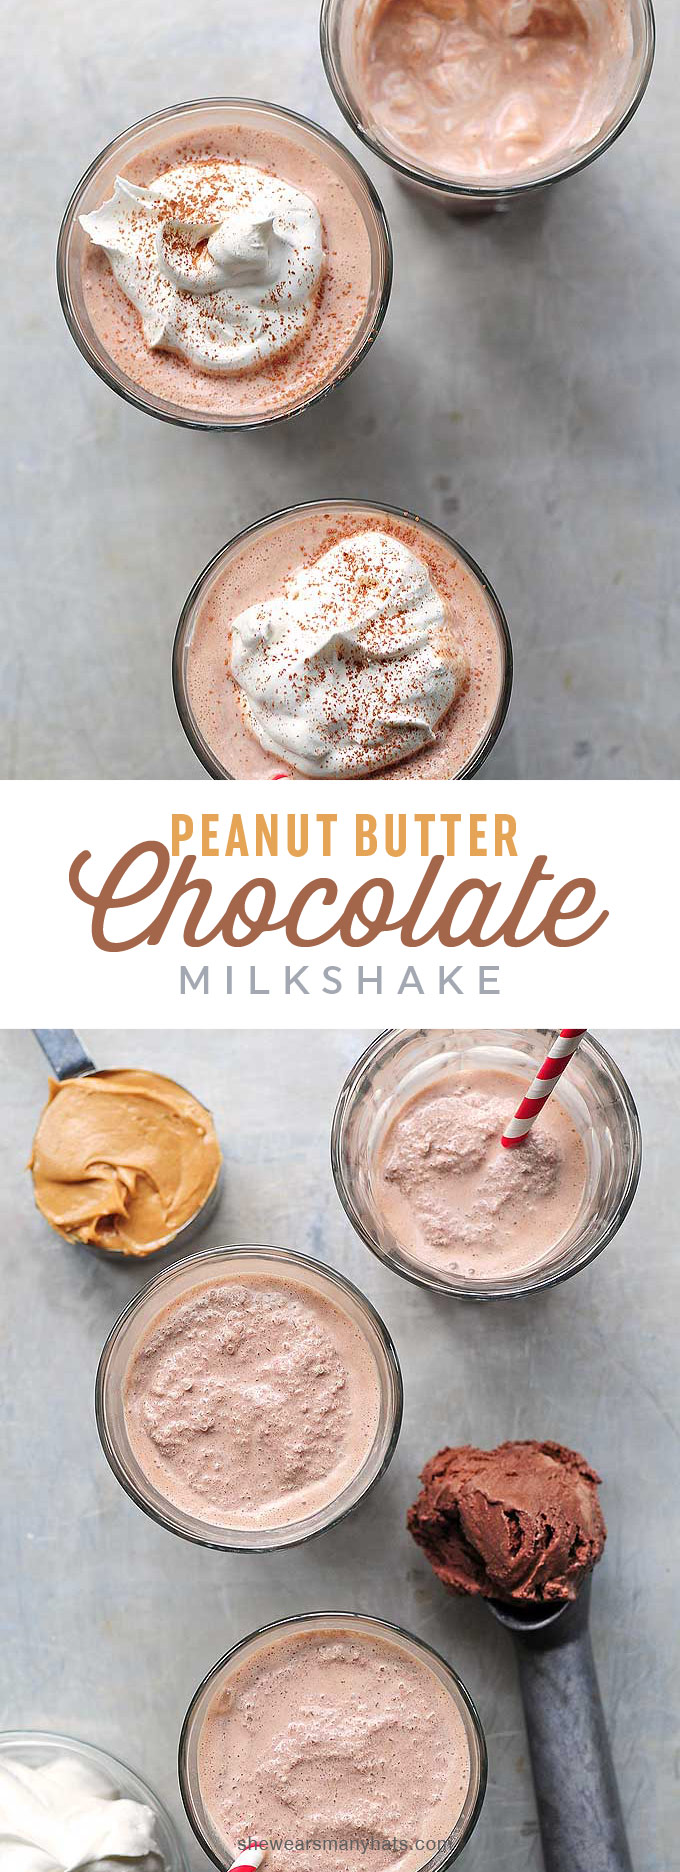 Peanut Butter Chocolate Milkshake Recipe   She Wears Many Hats